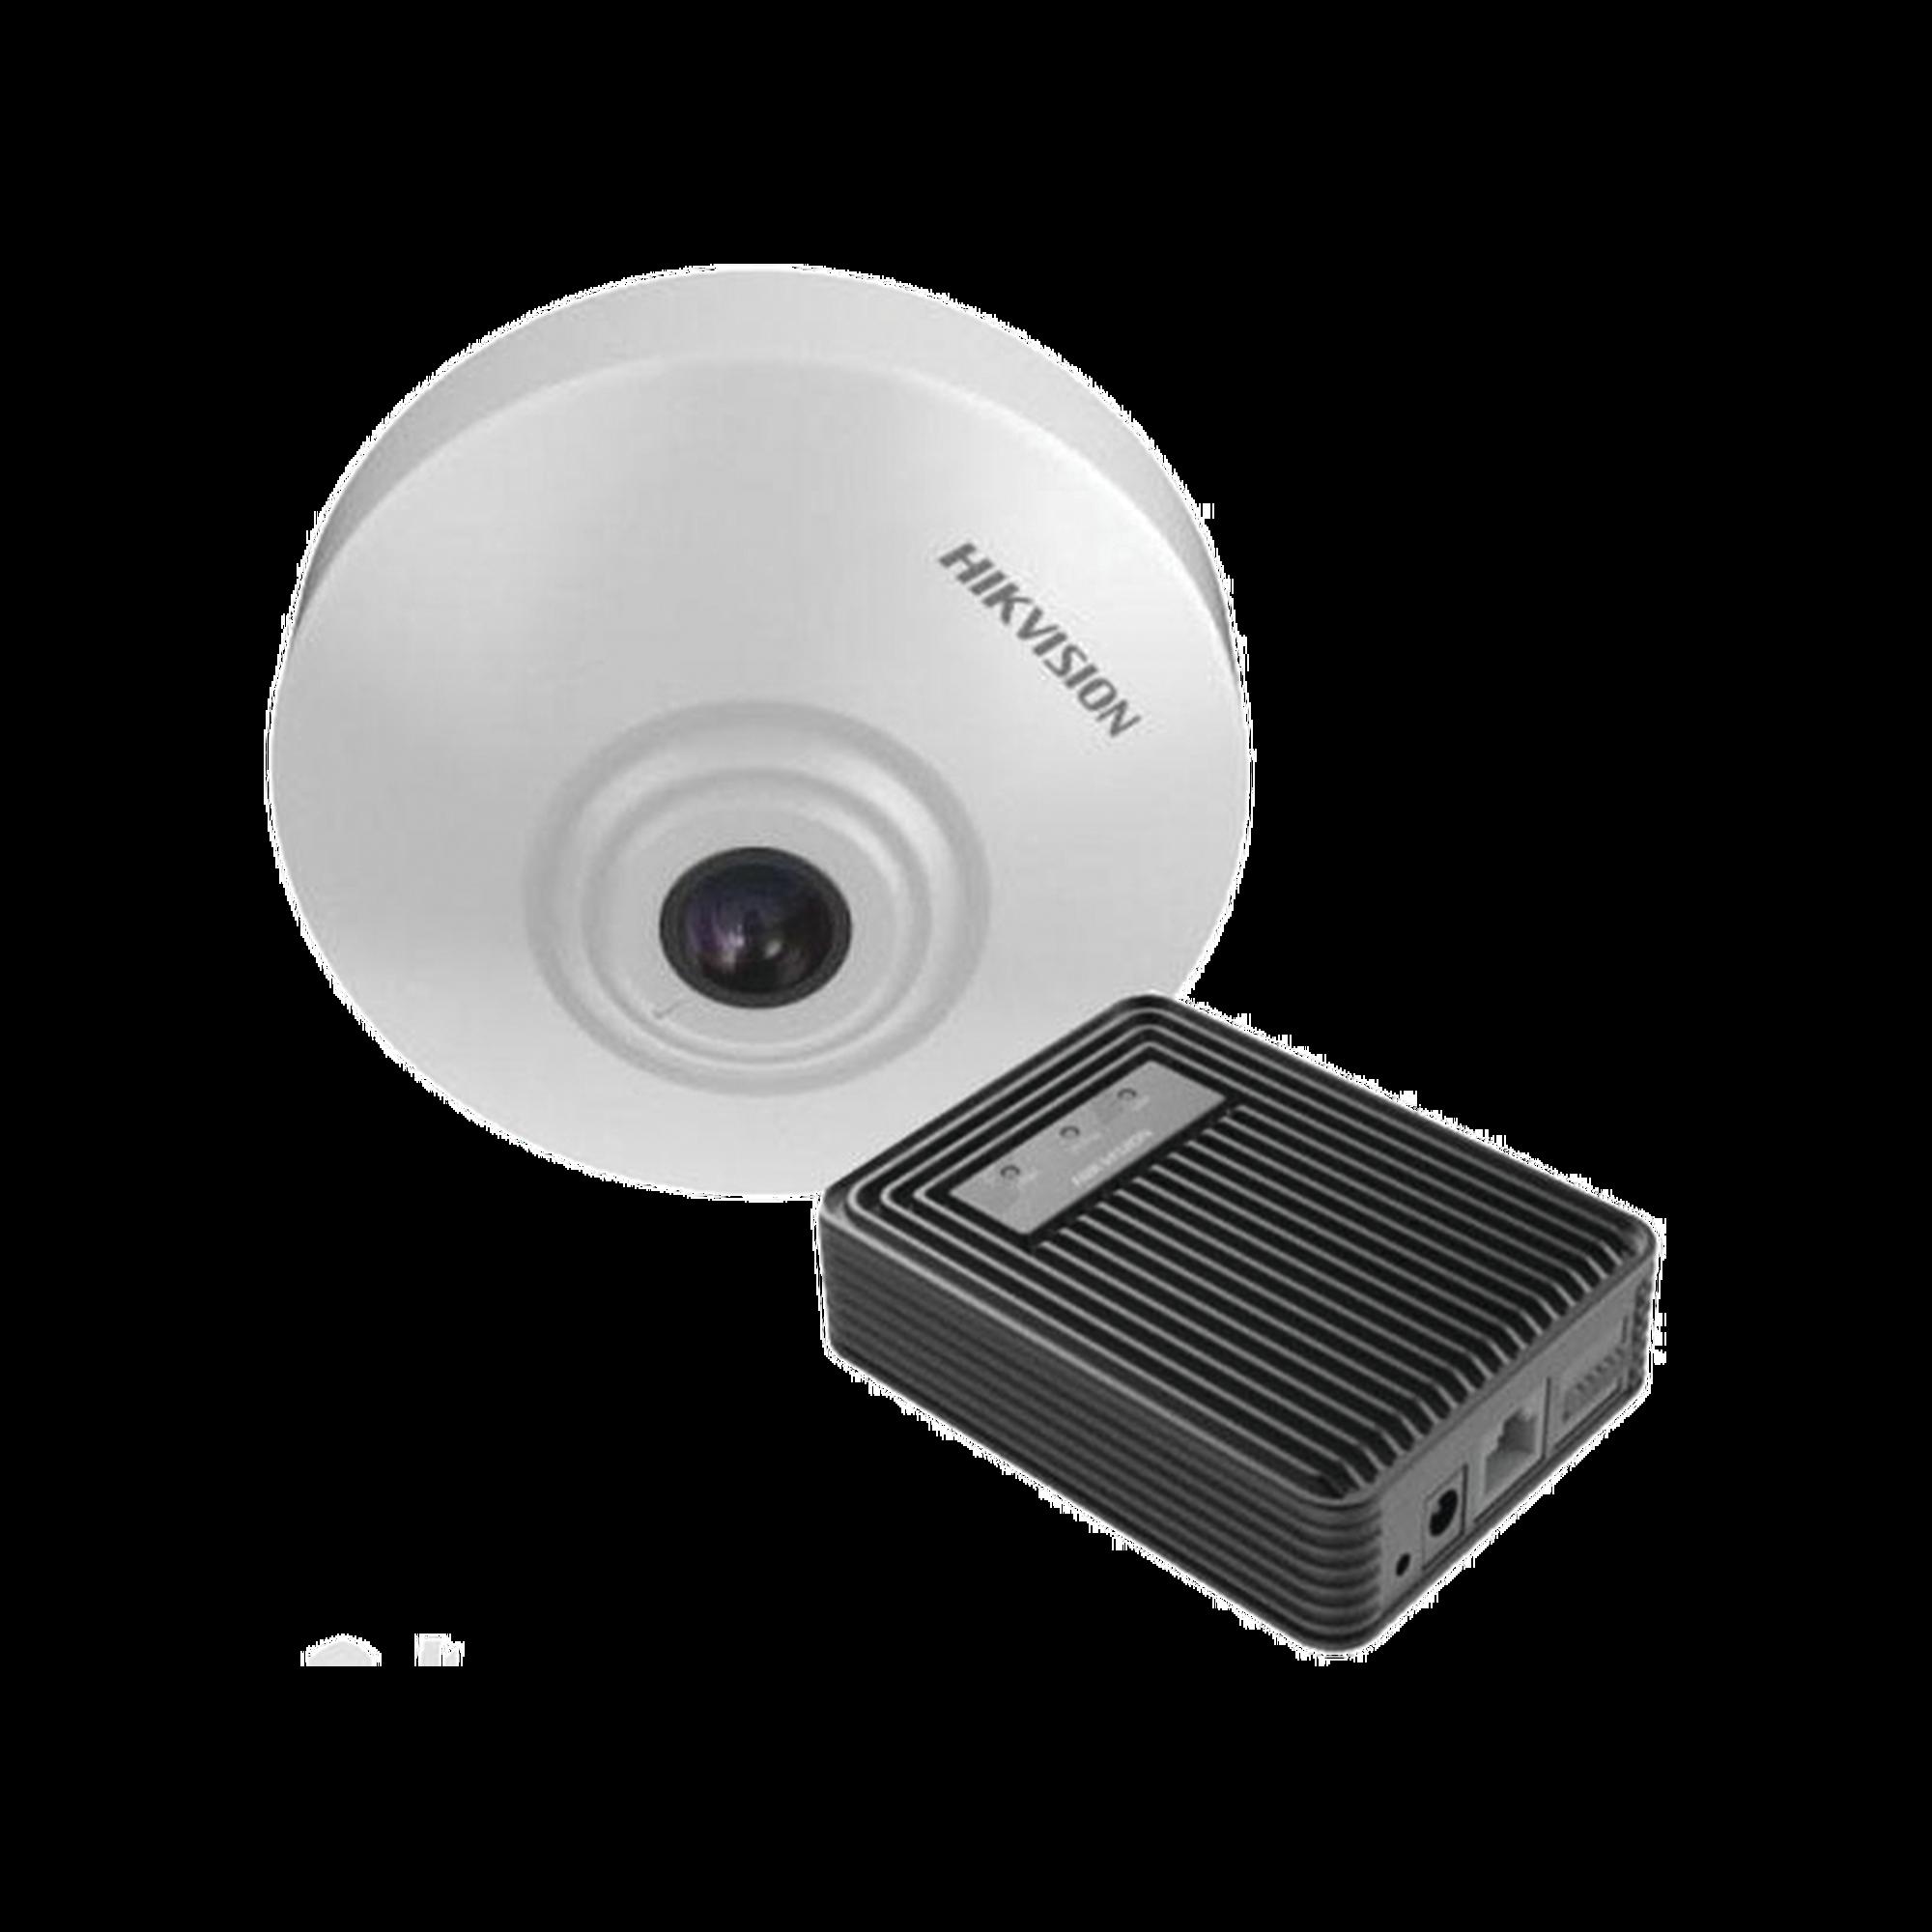 Pinhole IP 1.3 Megapixel / CONTEO DE PERSONAS / WDR 120dB / Lente 2.8 mm / ONVIF / HLC / EIS / Defog